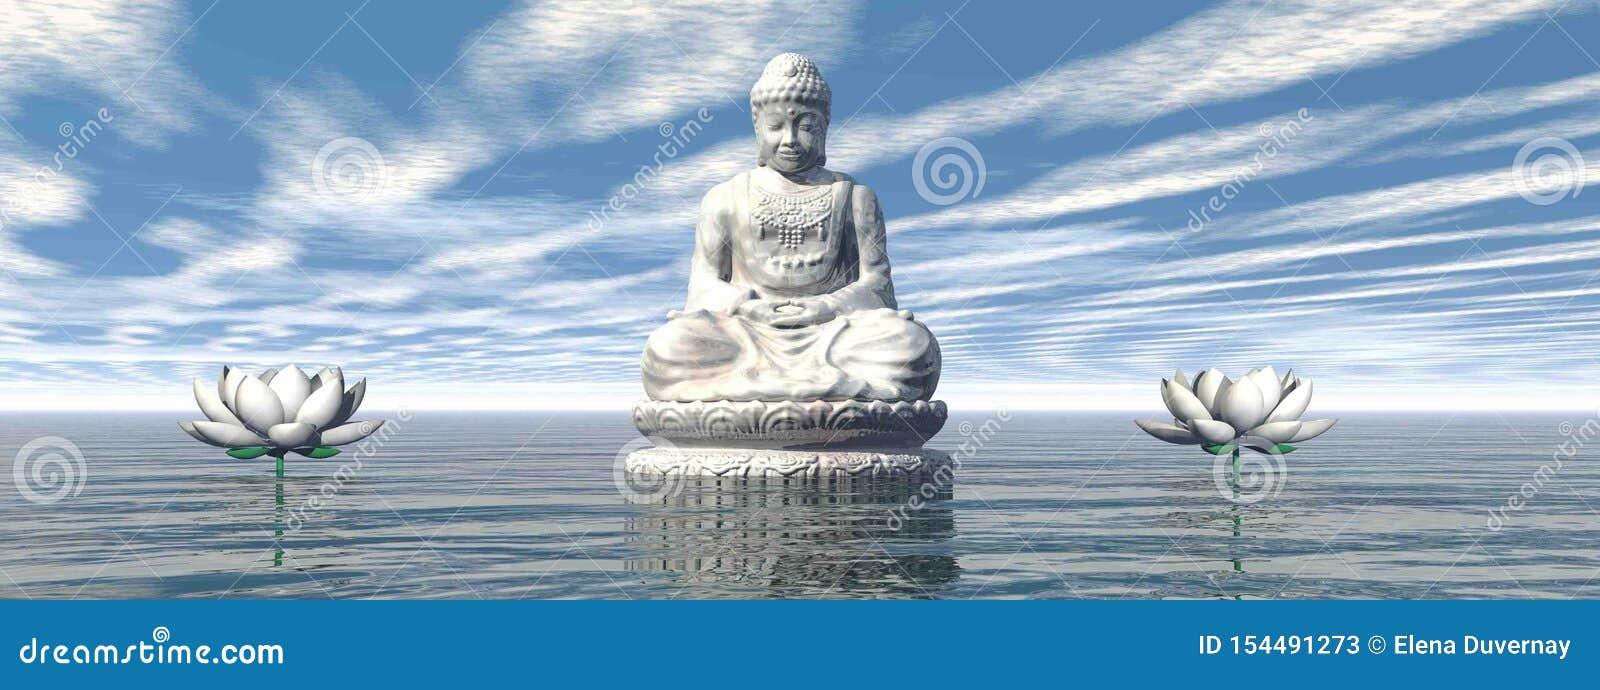 White Buddha meditating by day - 3D render